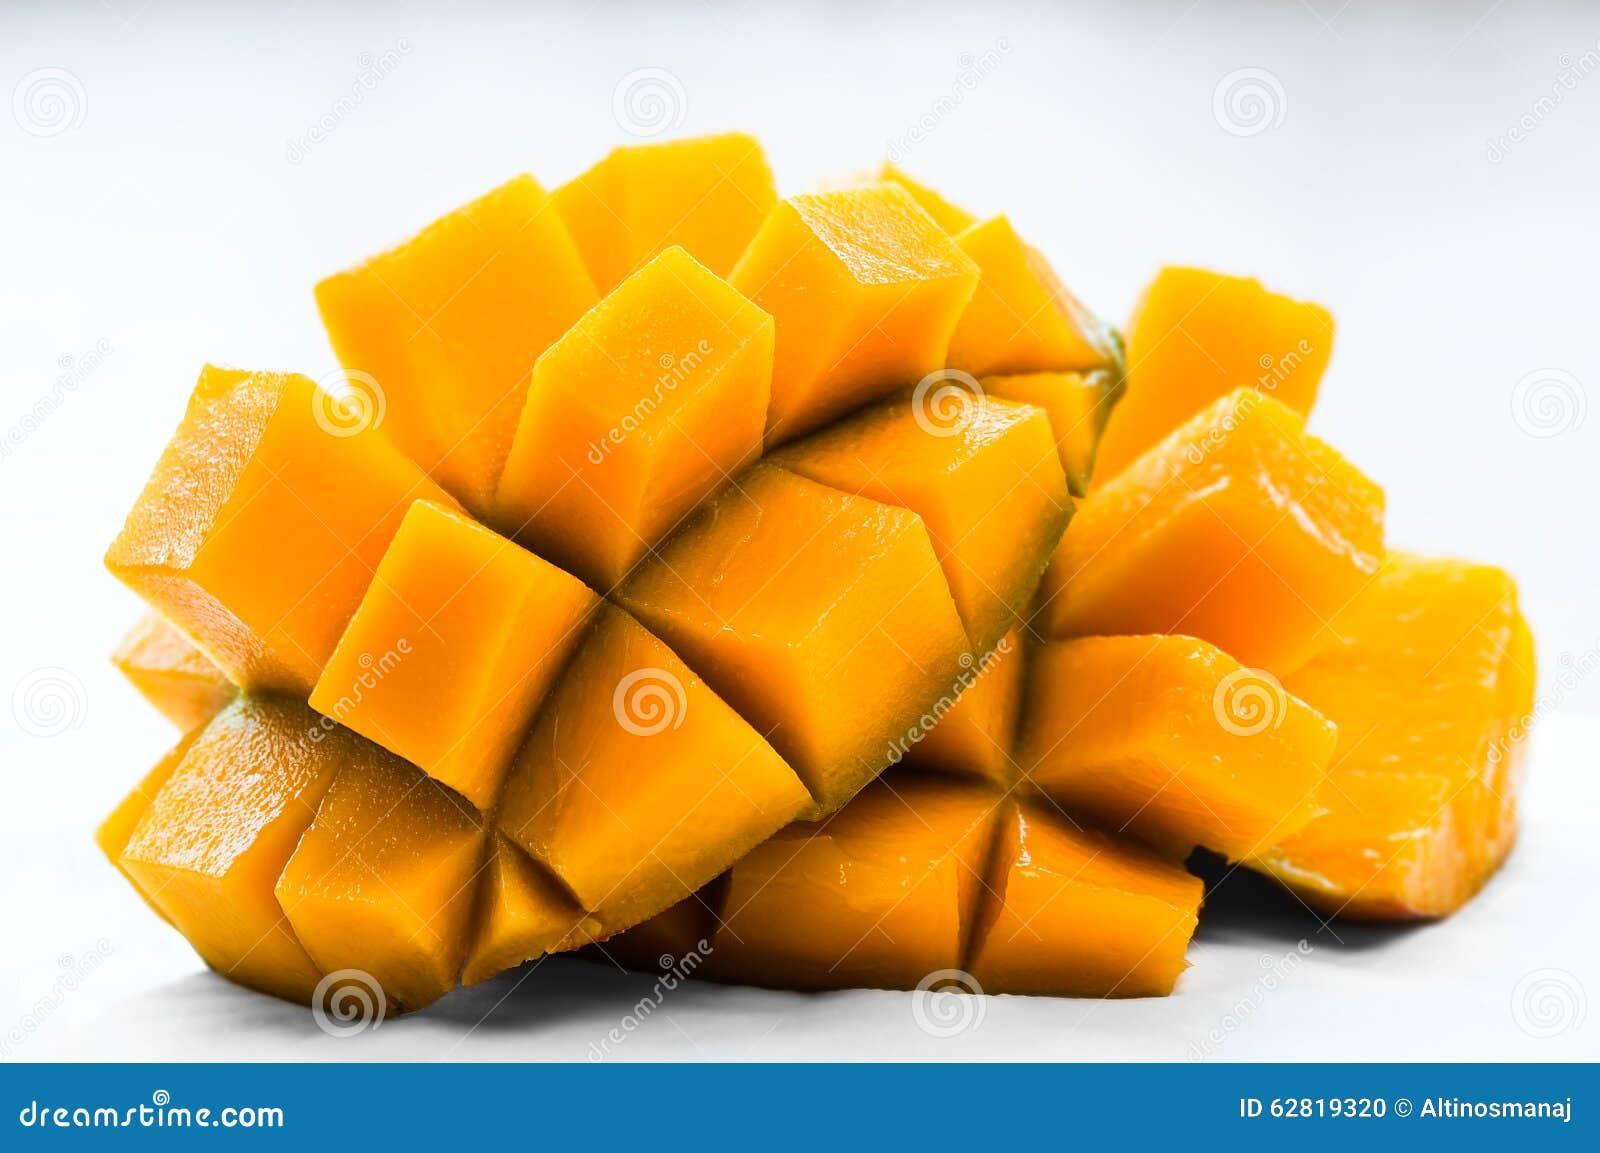 Mango Sliced On The Skin Ready To Eatanic Healthy Snack Juicy Fresh